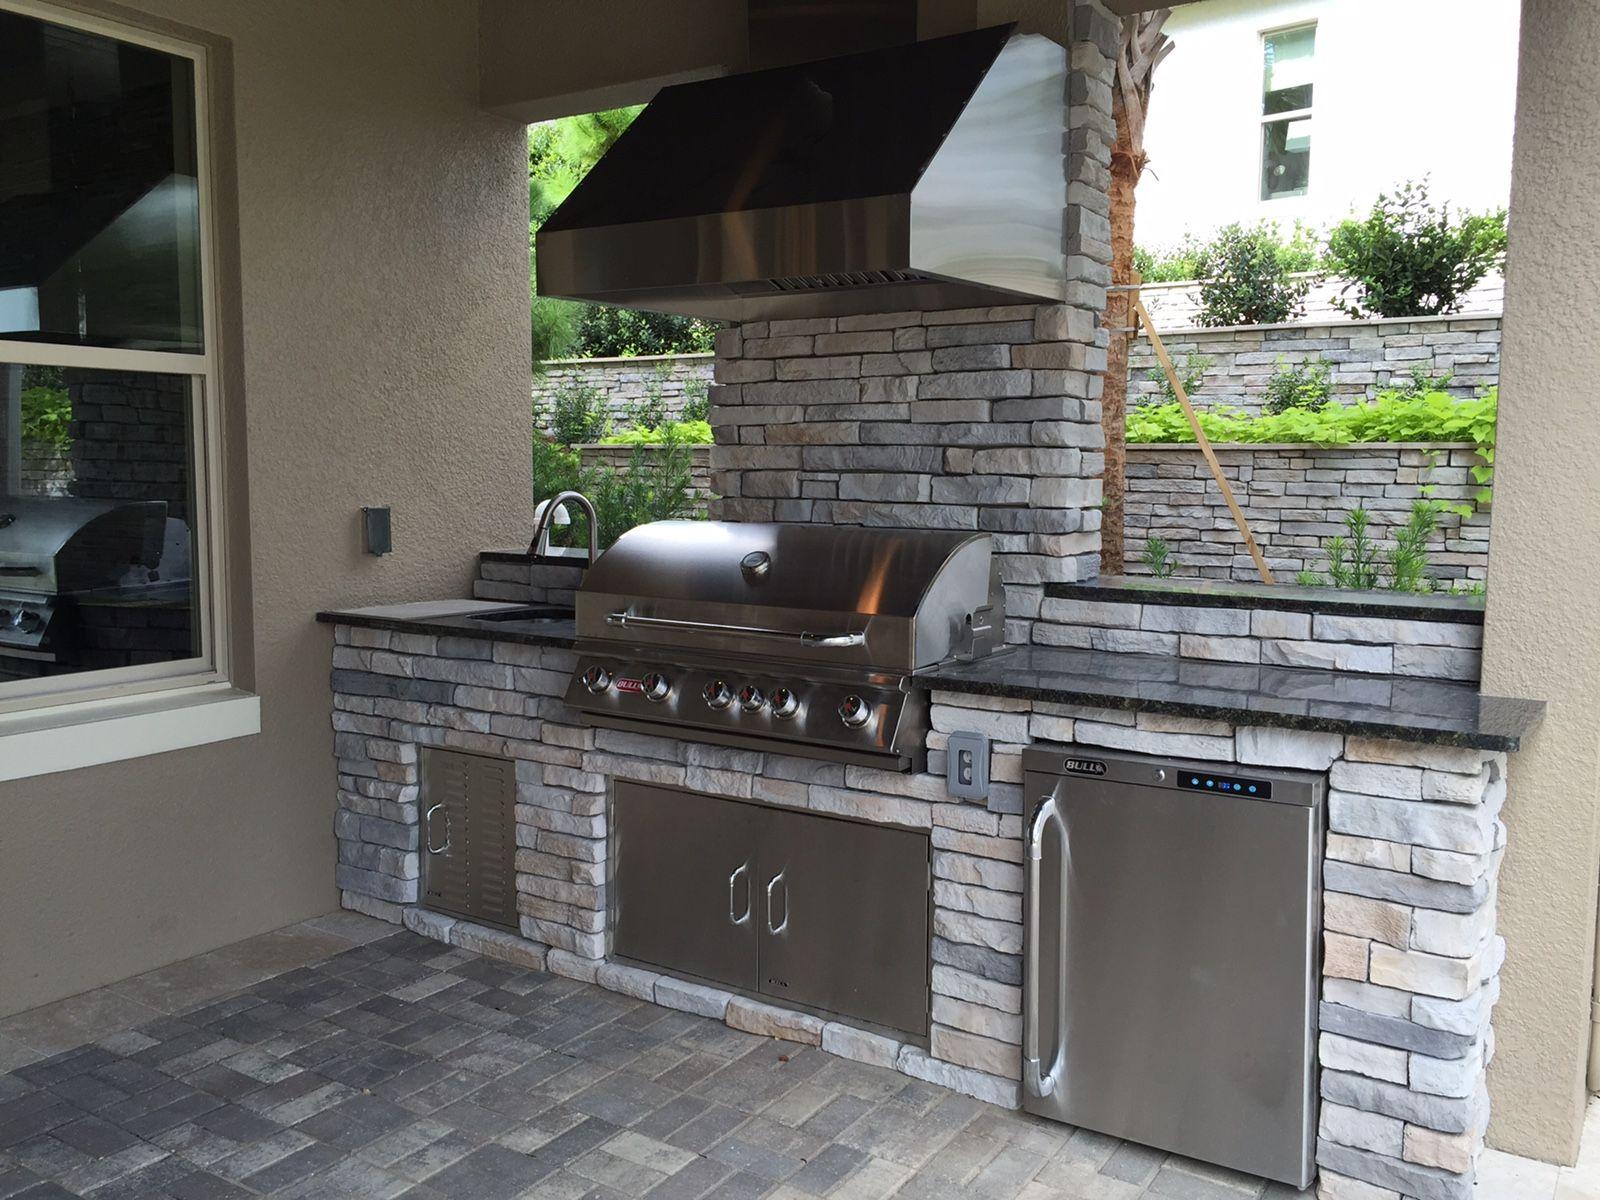 Outdoor Living Photos Orlando Winter Garden Fire Pitsbob S Pools Screens Outdoor Kitchen Patios Patios Muebles